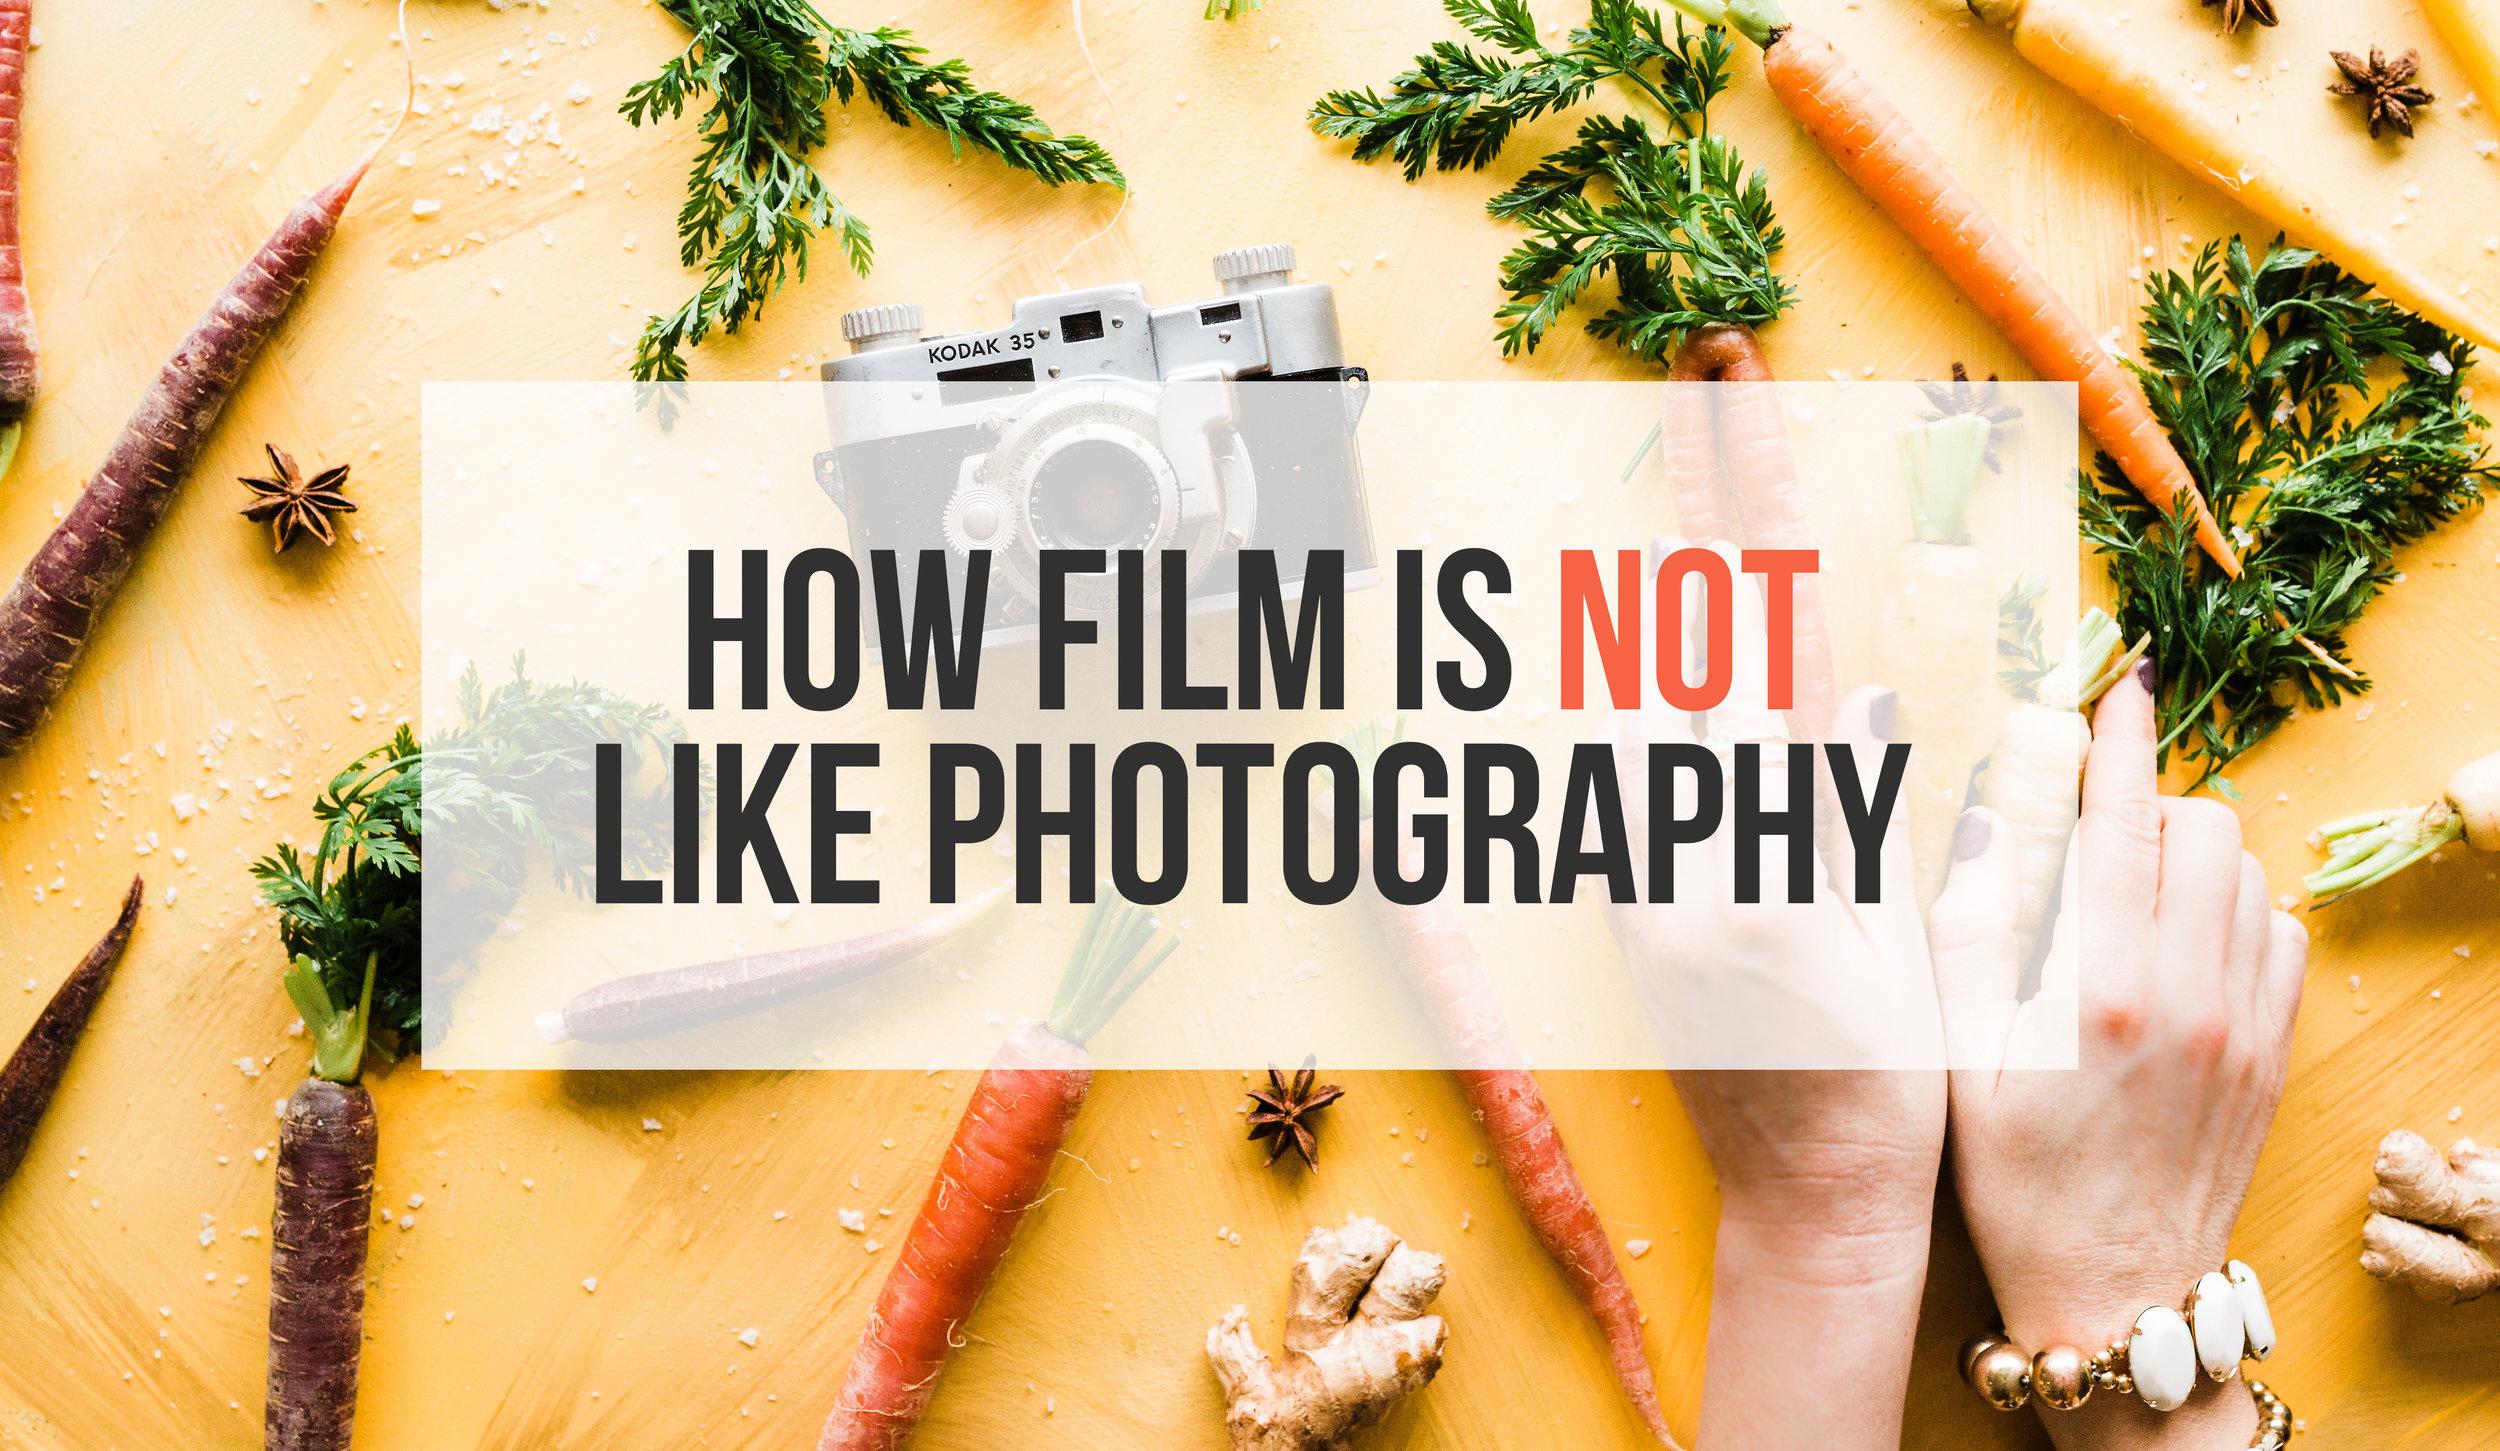 Not like photography.jpg